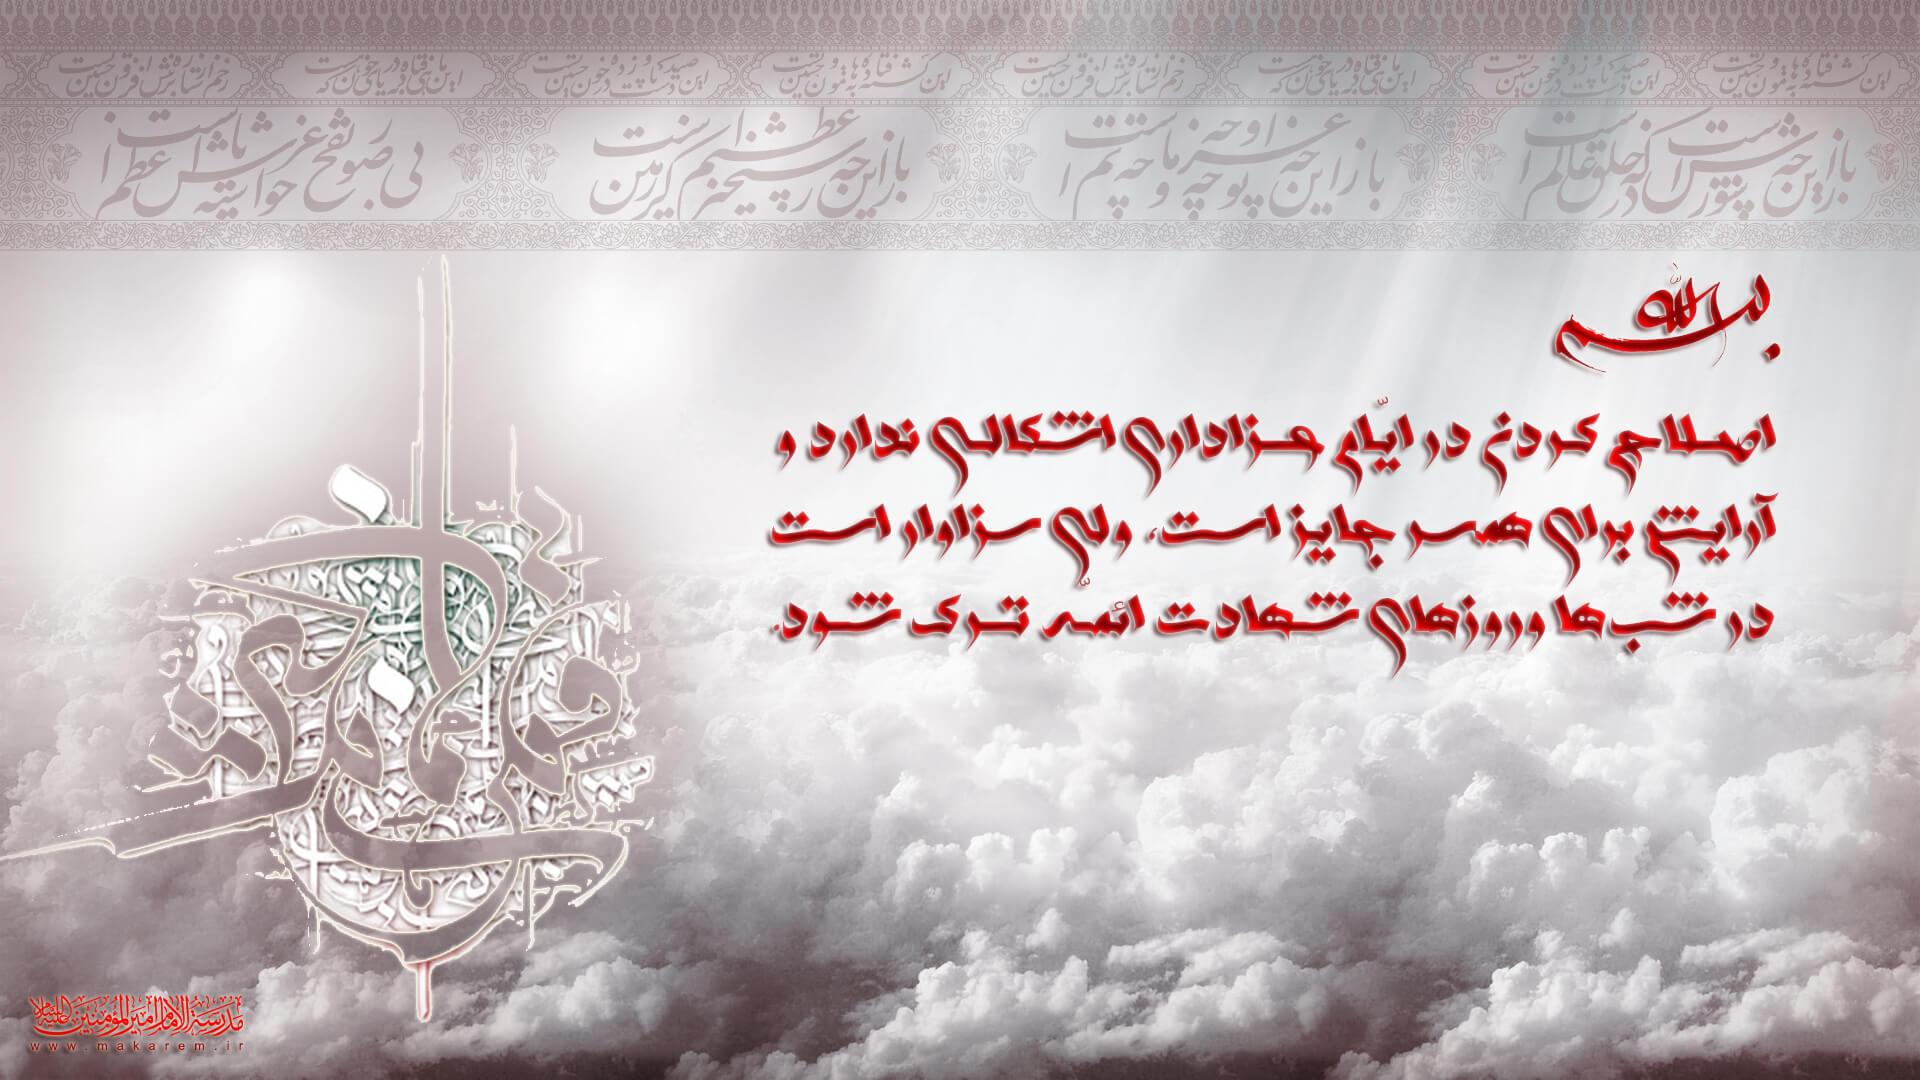 احکام عزاداری 01-مدرسه الامام امیر المومنین (ع)